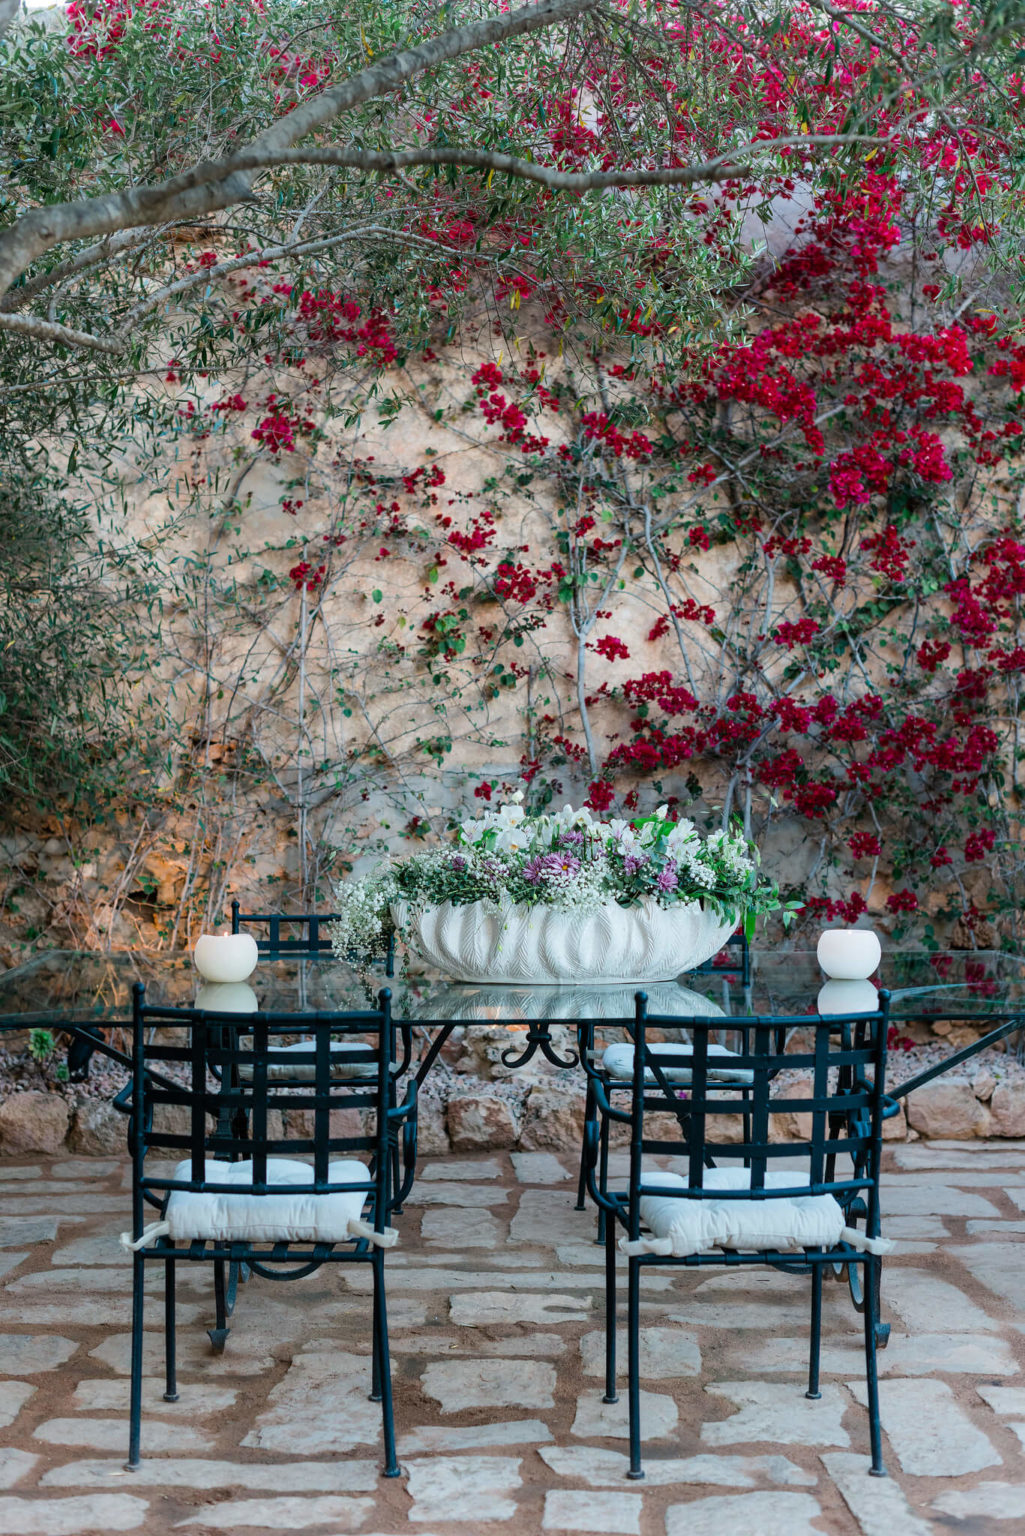 https://www.white-ibiza.com/wp-content/uploads/2020/03/formentera-restaurants-can-carlos-2020-04-1025x1536.jpg